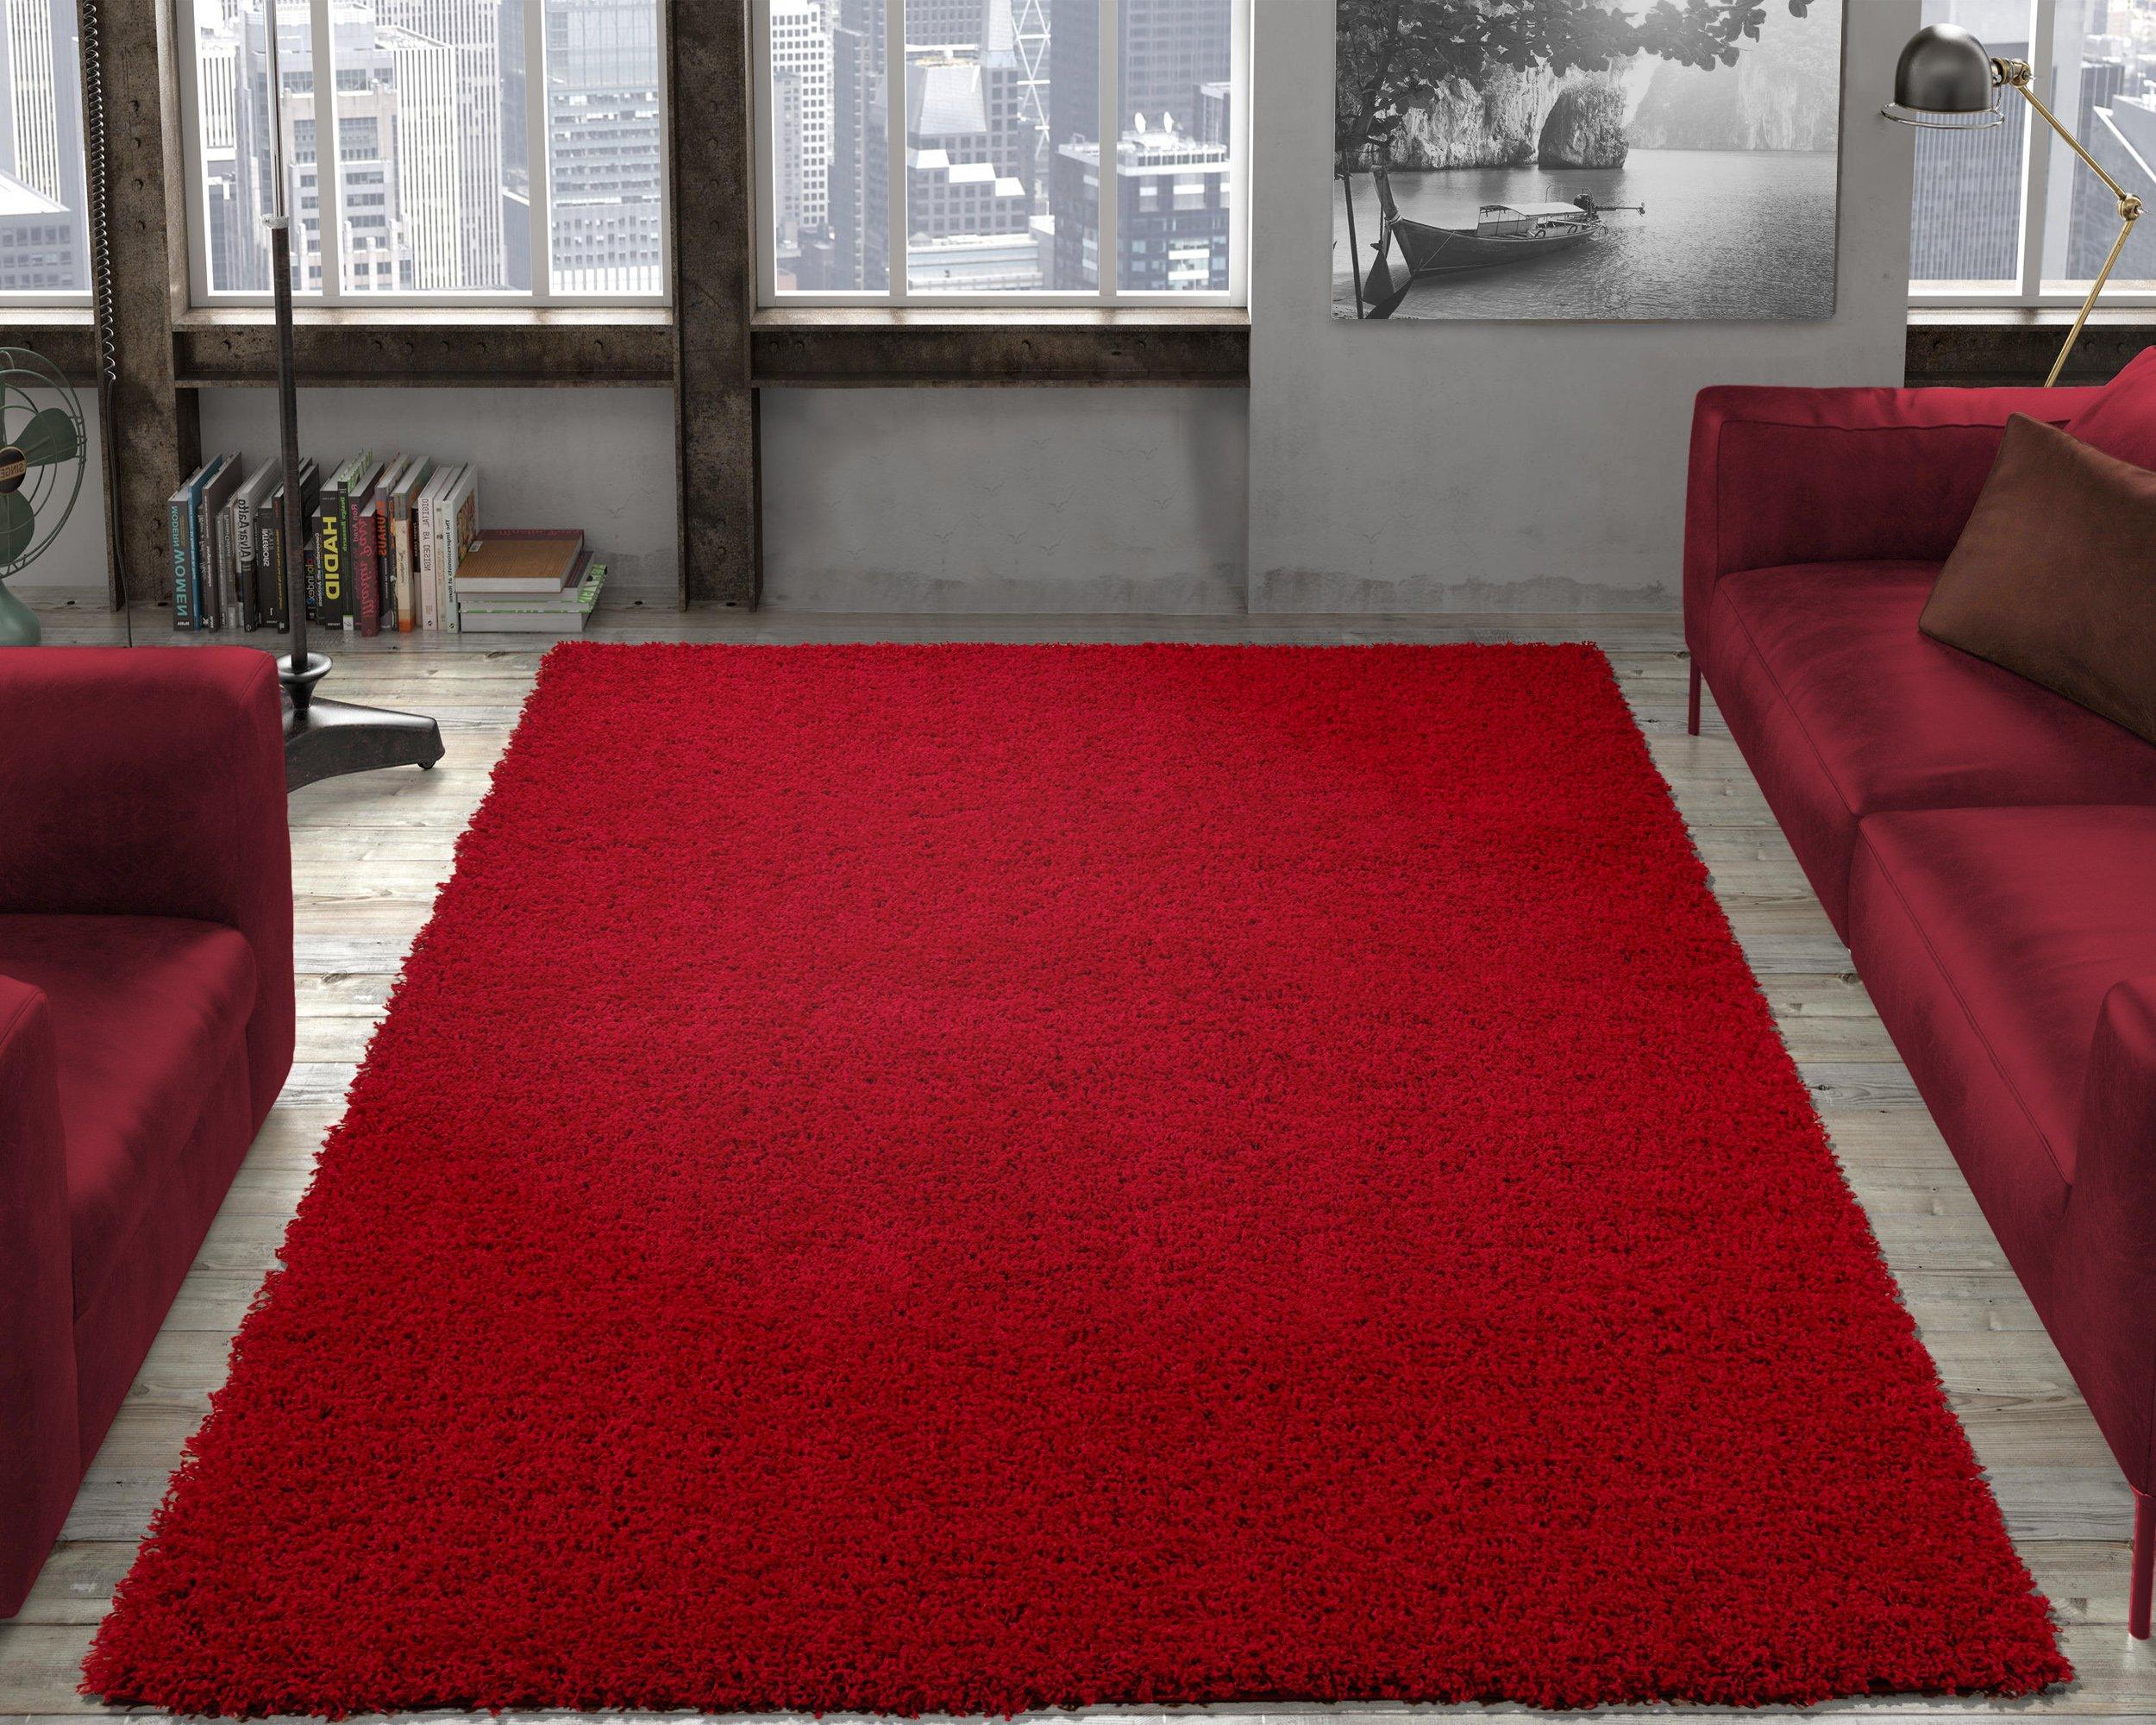 Ottomanson SHG2760-8X10 Collection shag Area Rug 7'10'' x 9'10'' Red